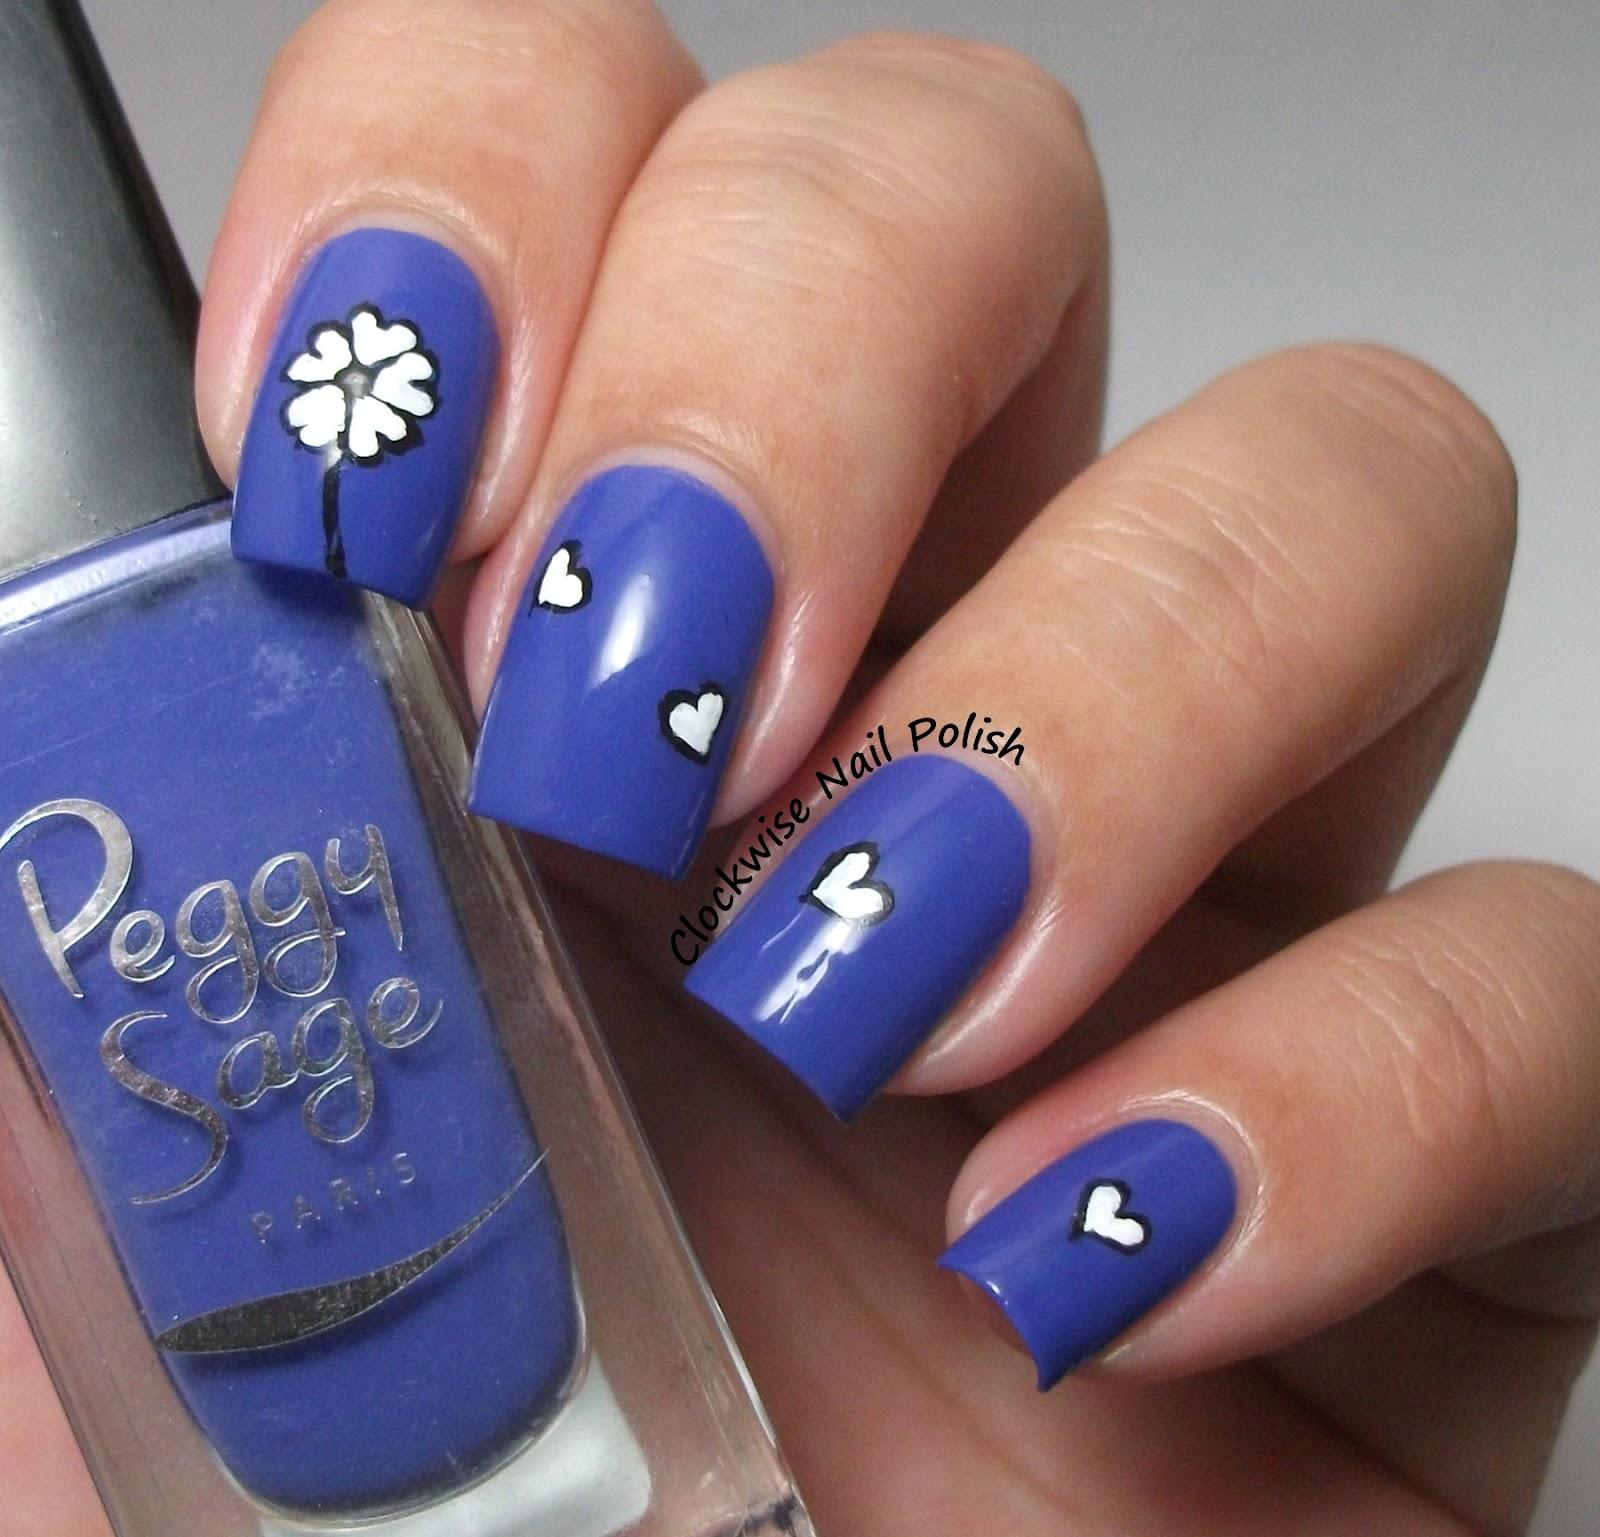 Nail Art Blue Floral: The Clockwise Nail Polish: Peggy Sage Blue Temptation